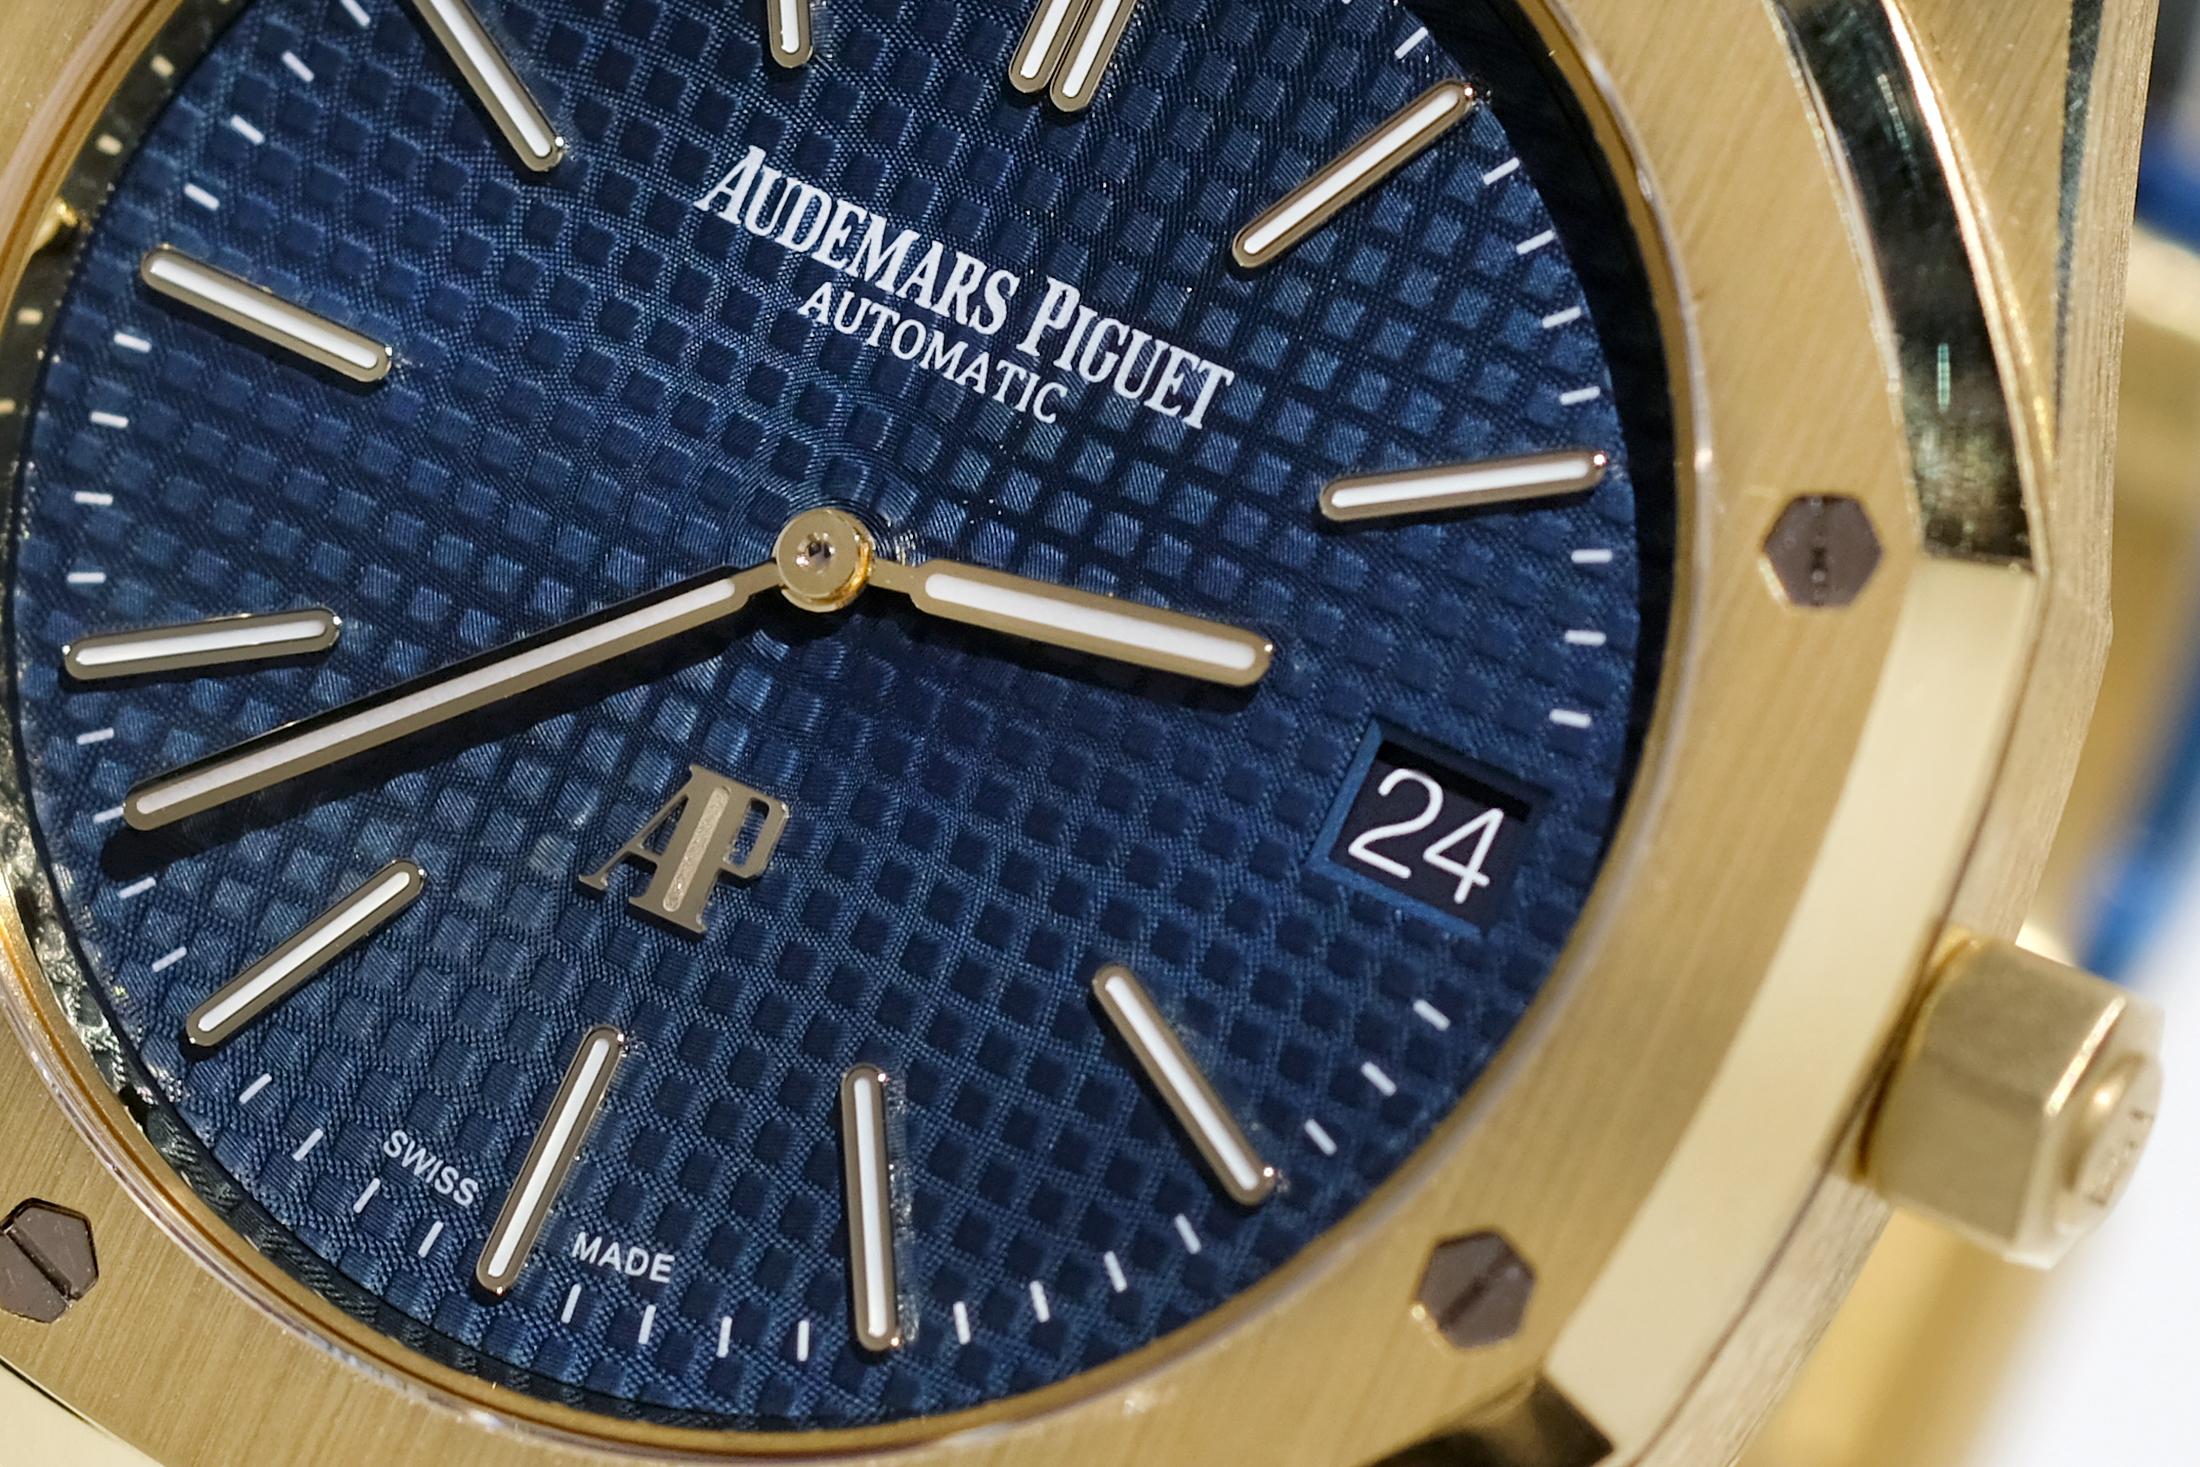 audemars-piguet-royaloak-15202-blue-dial-on-yellow-gold